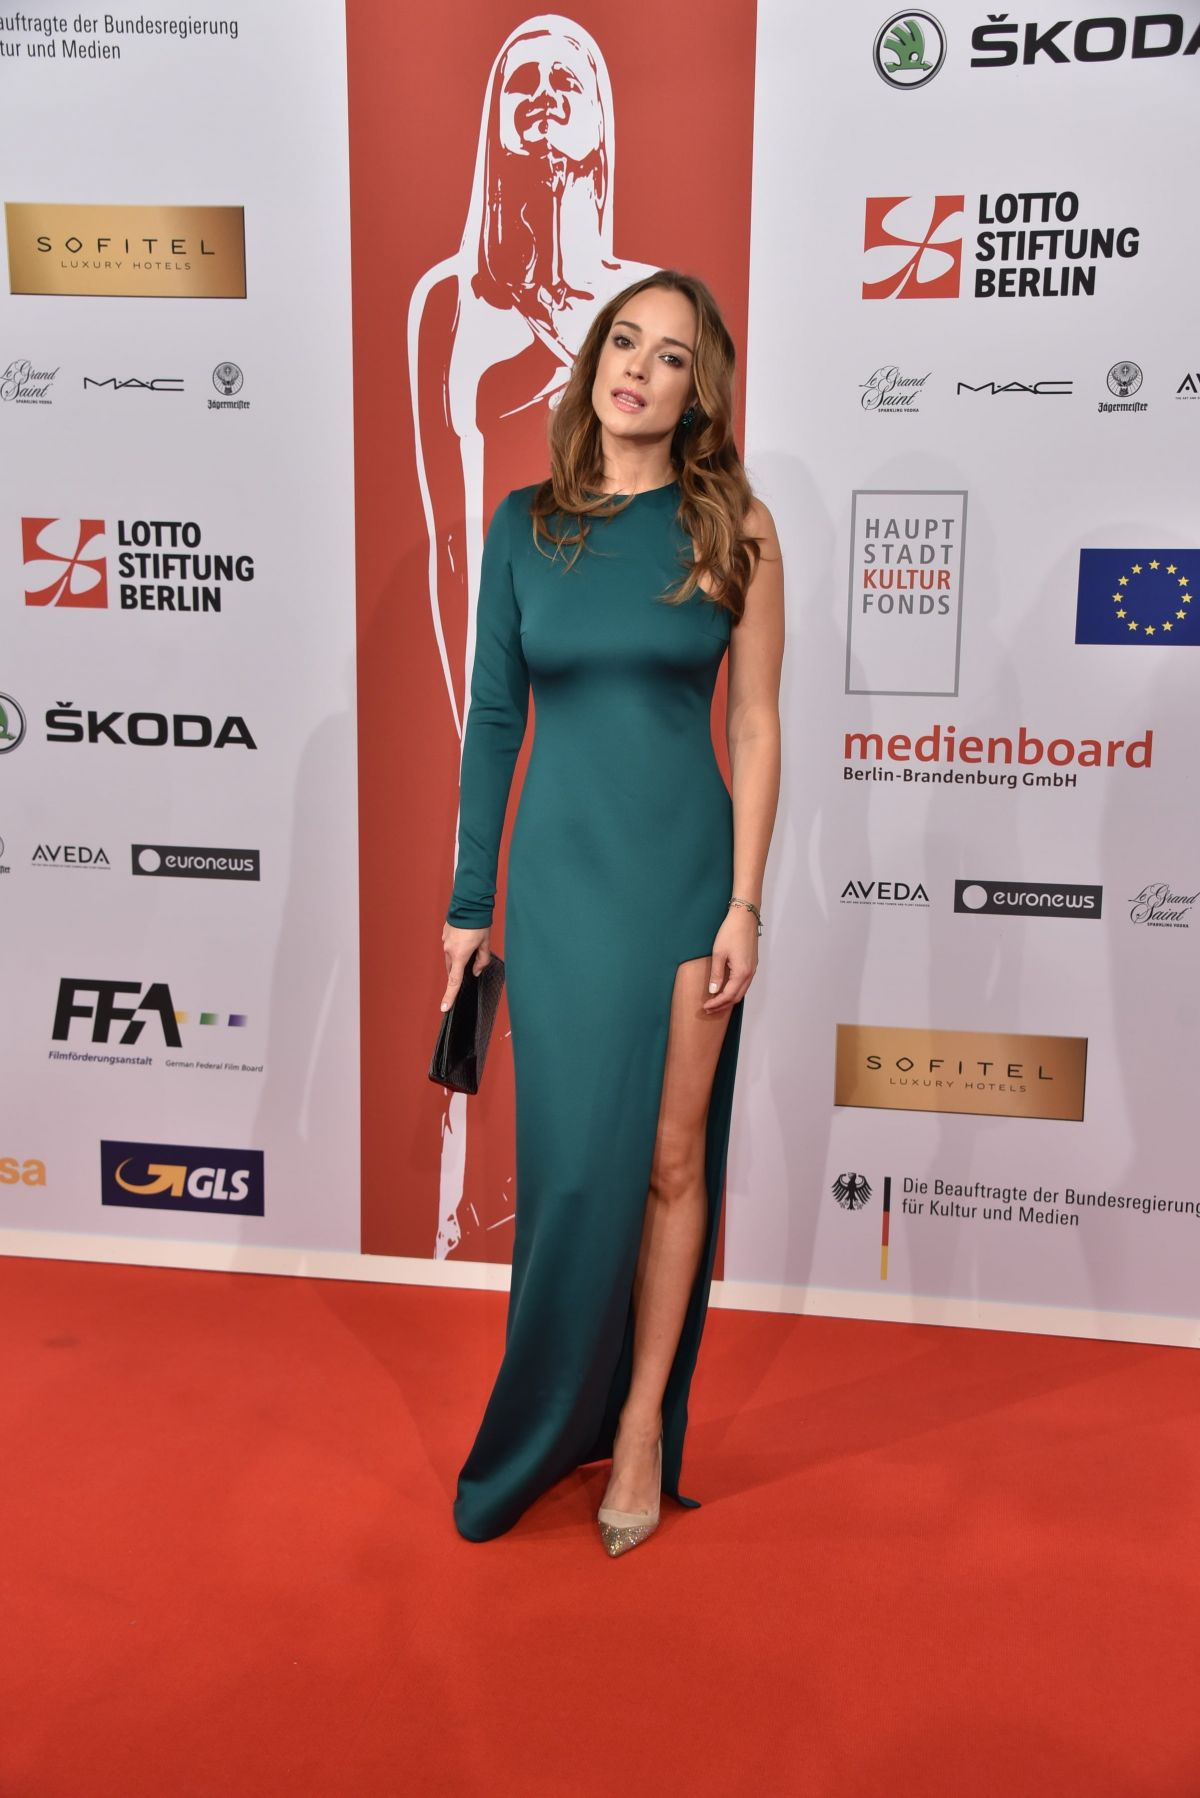 ALICJA BACHLEDA-CURUS at 28th Annual European Film Awards